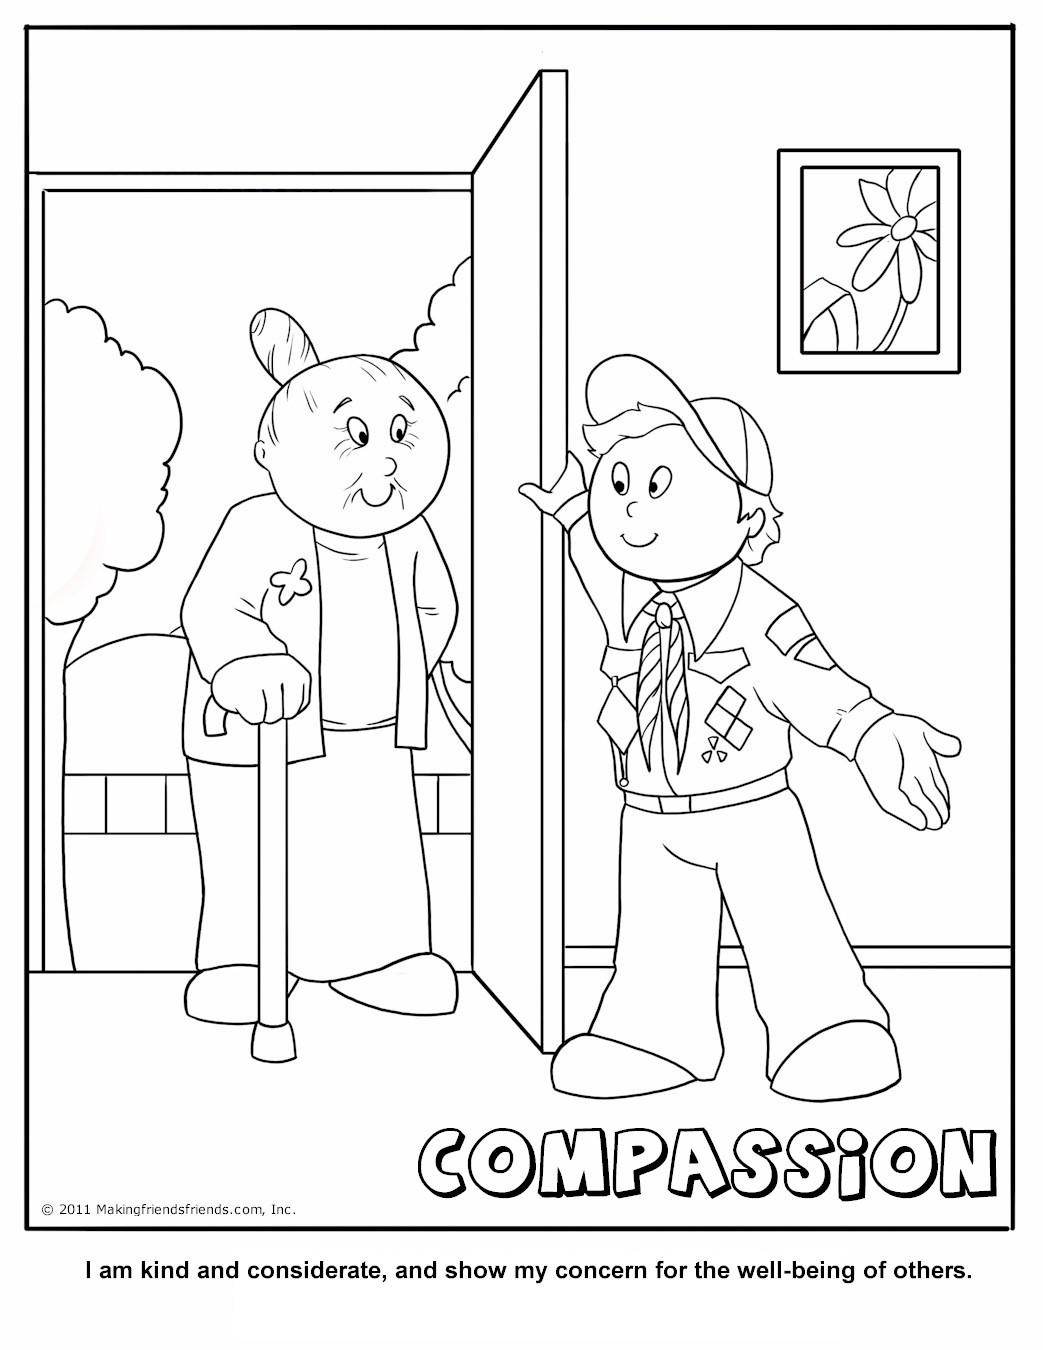 Cub Scout Compassion Coloring Page